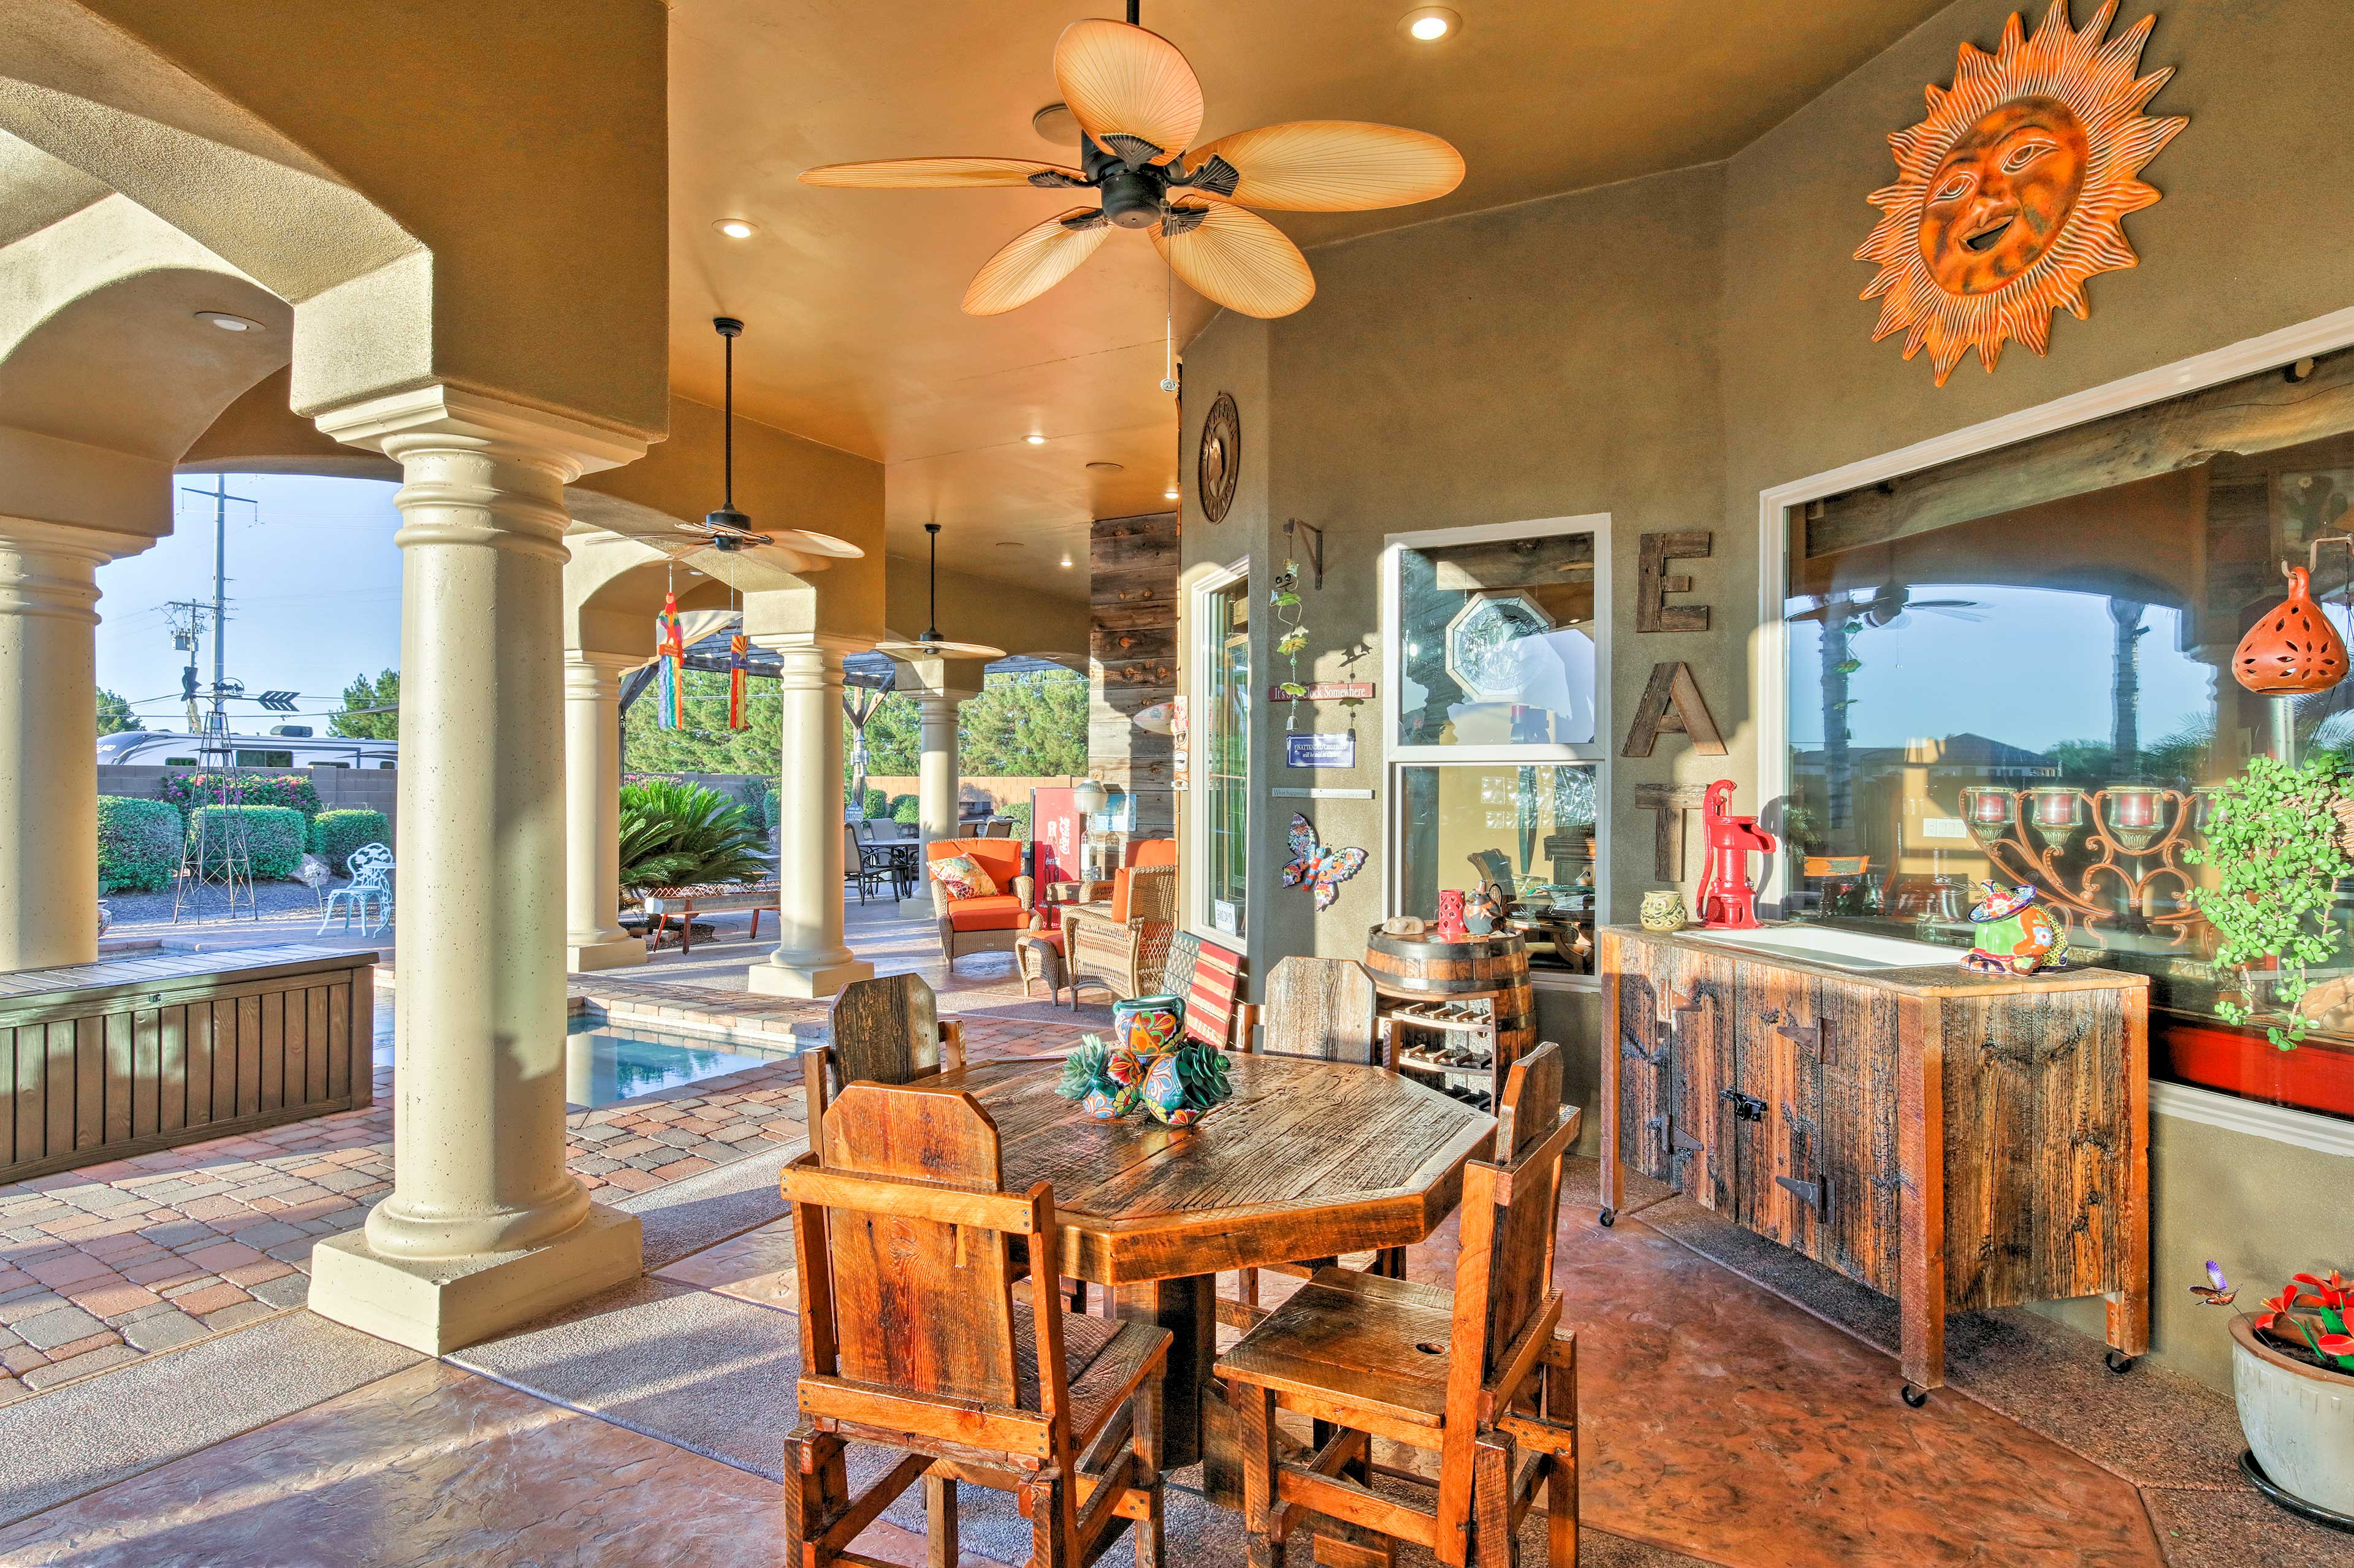 Enjoy the Arizona weather in your elegant outdoor living space.